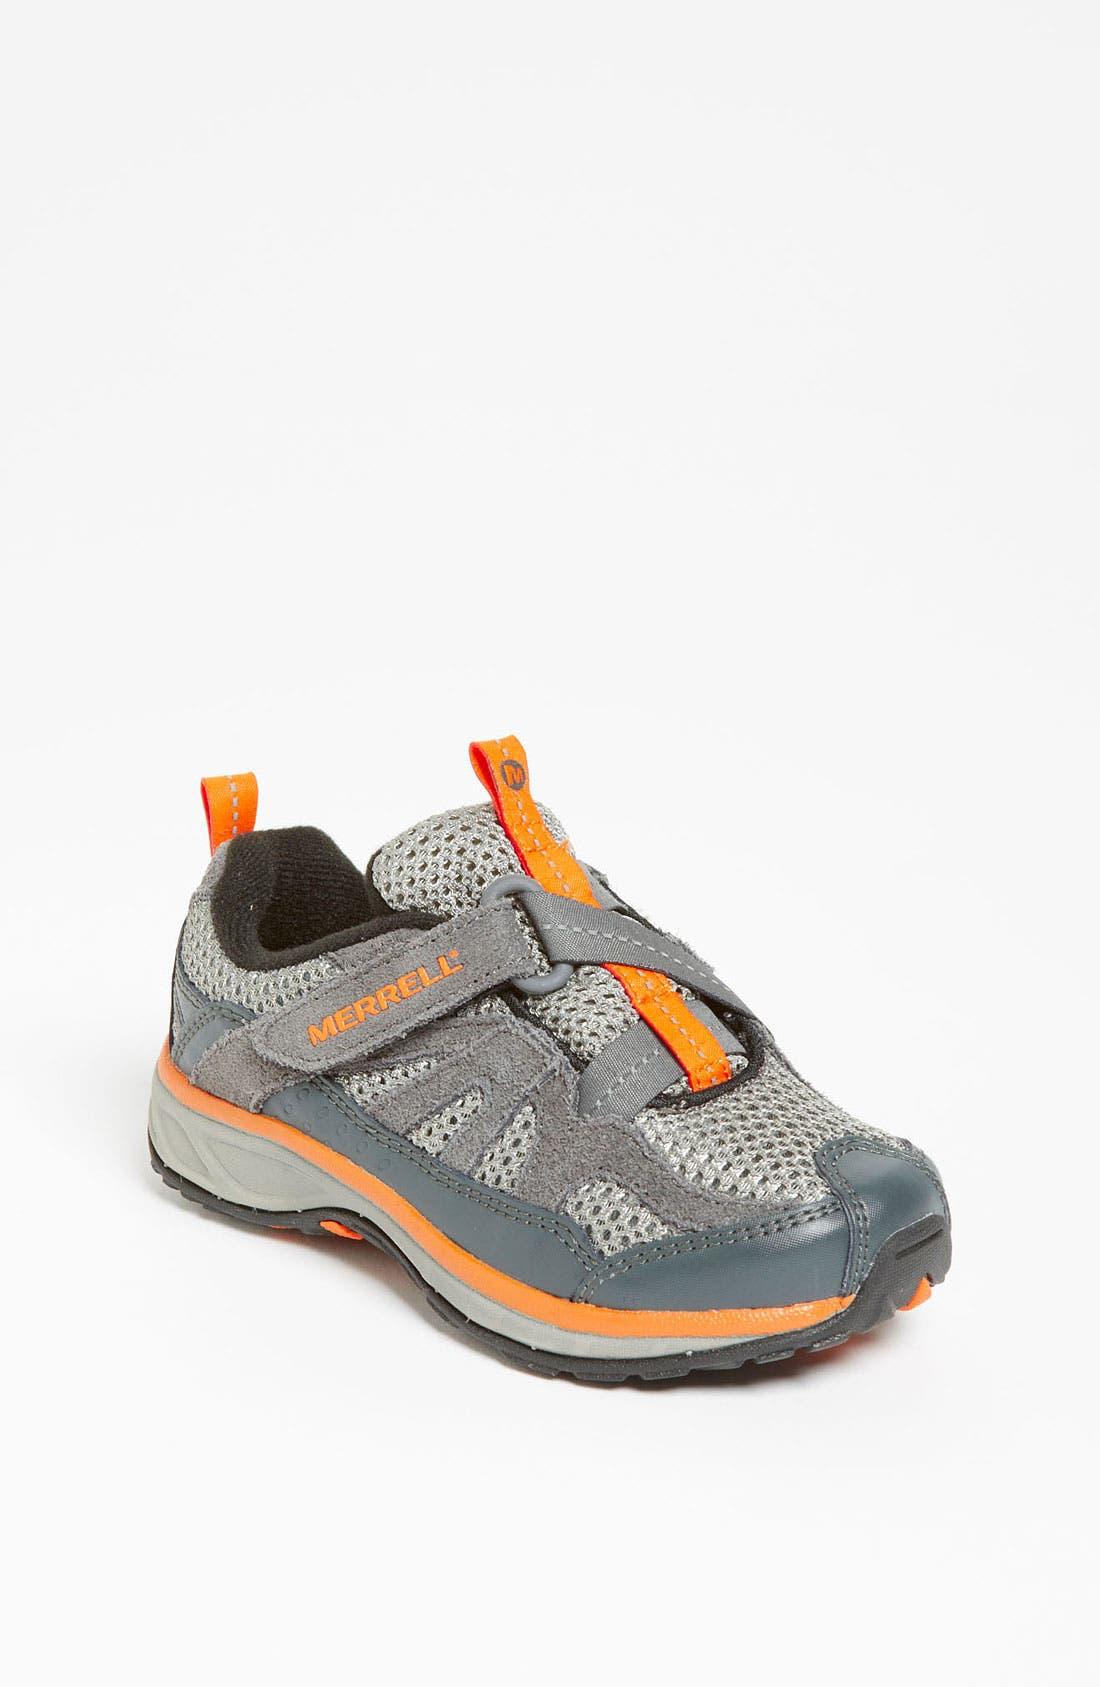 Main Image - Merrell 'Zoomerang' Sneaker (Toddler, Little Kid & Big Kid)